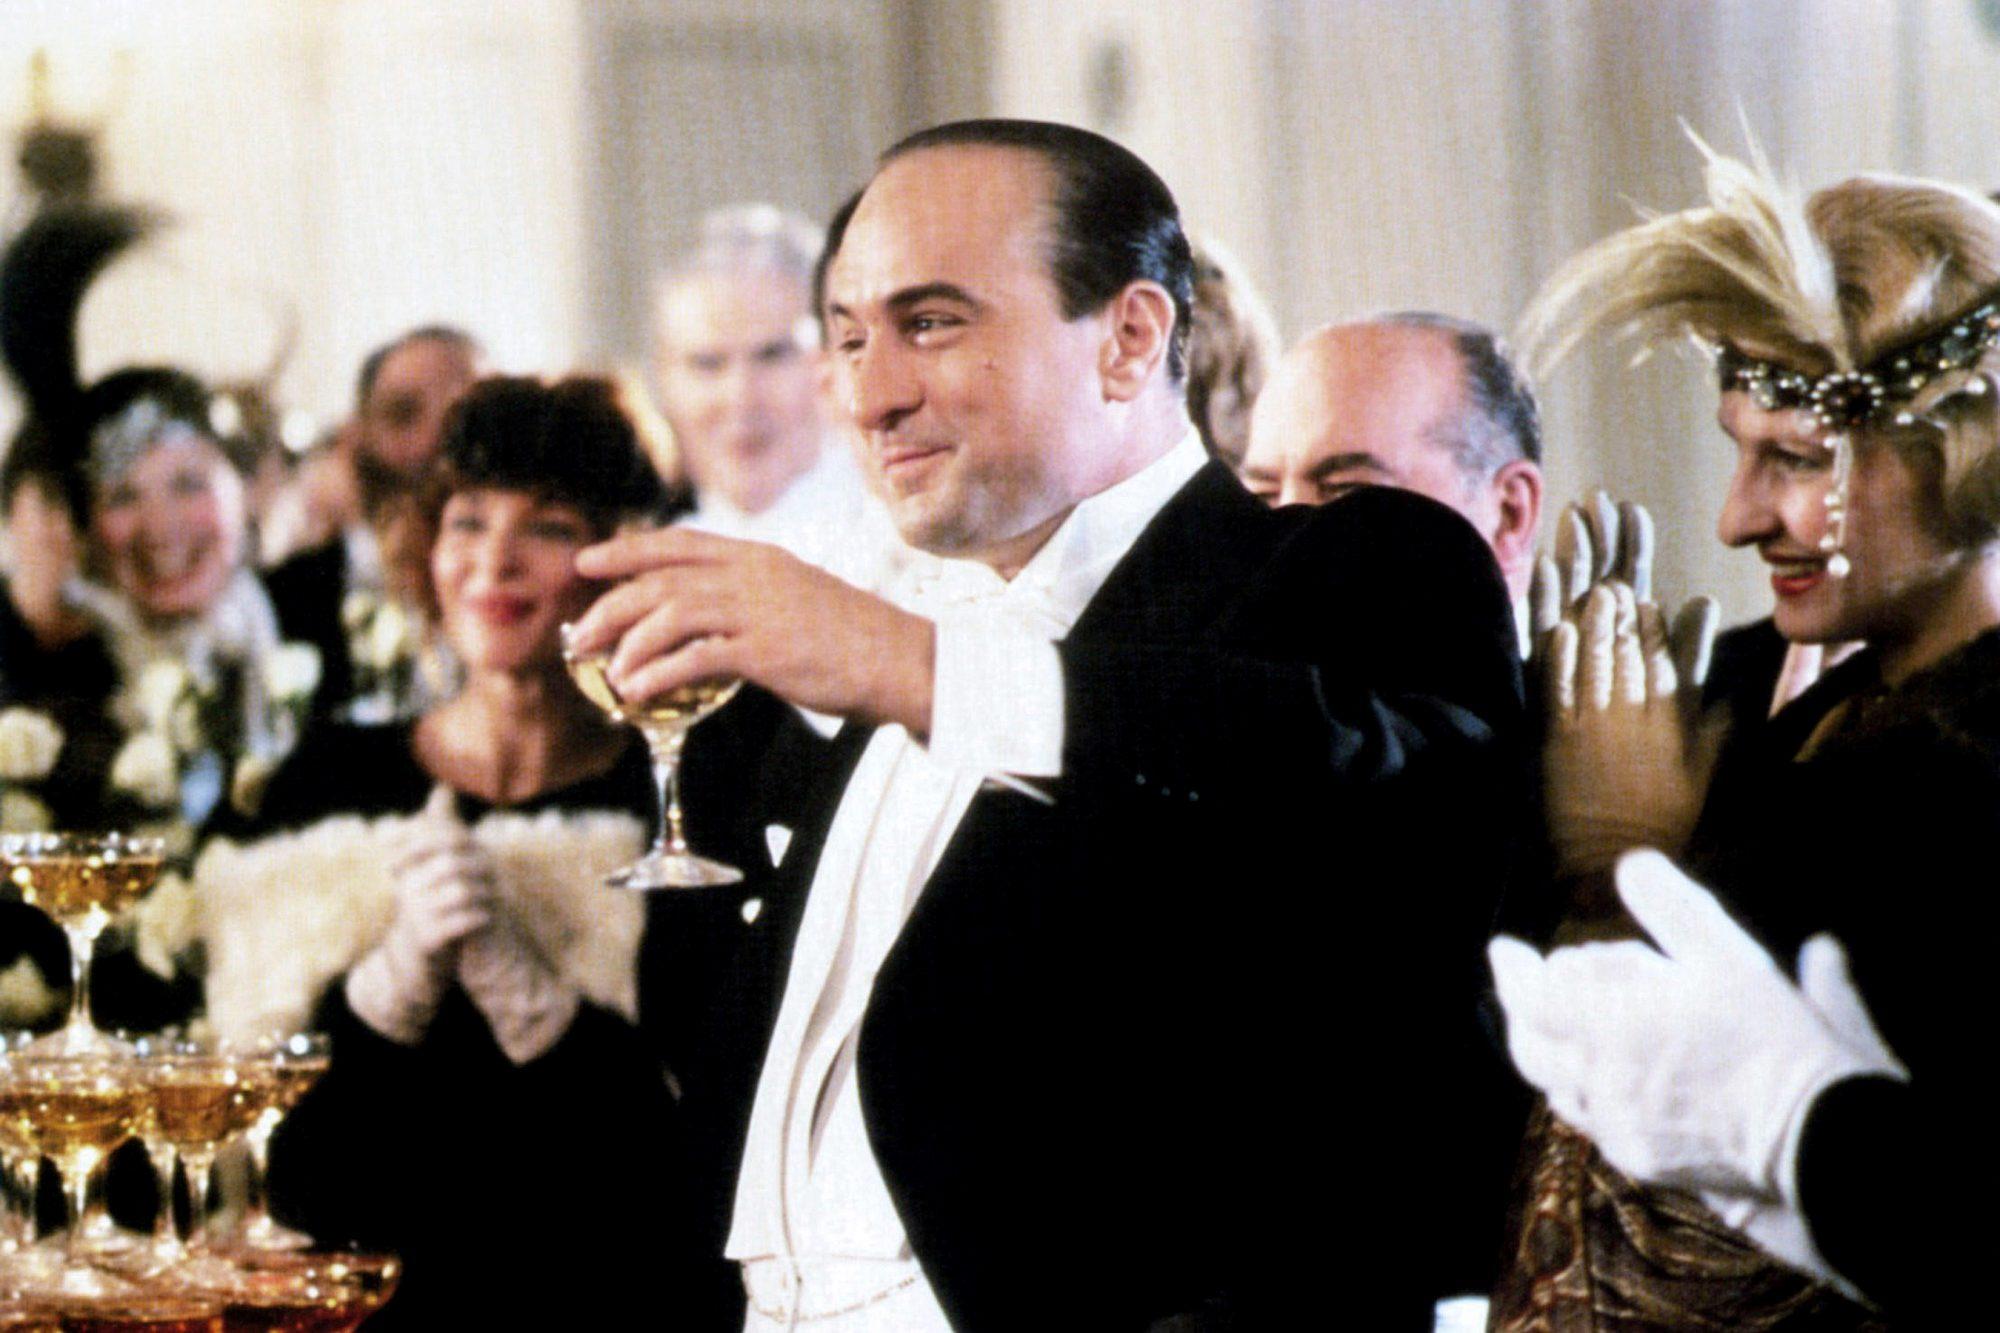 THE UNTOUCHABLES, Robert De Niro, 1987, ©Paramount/Courtesy Everett Collection